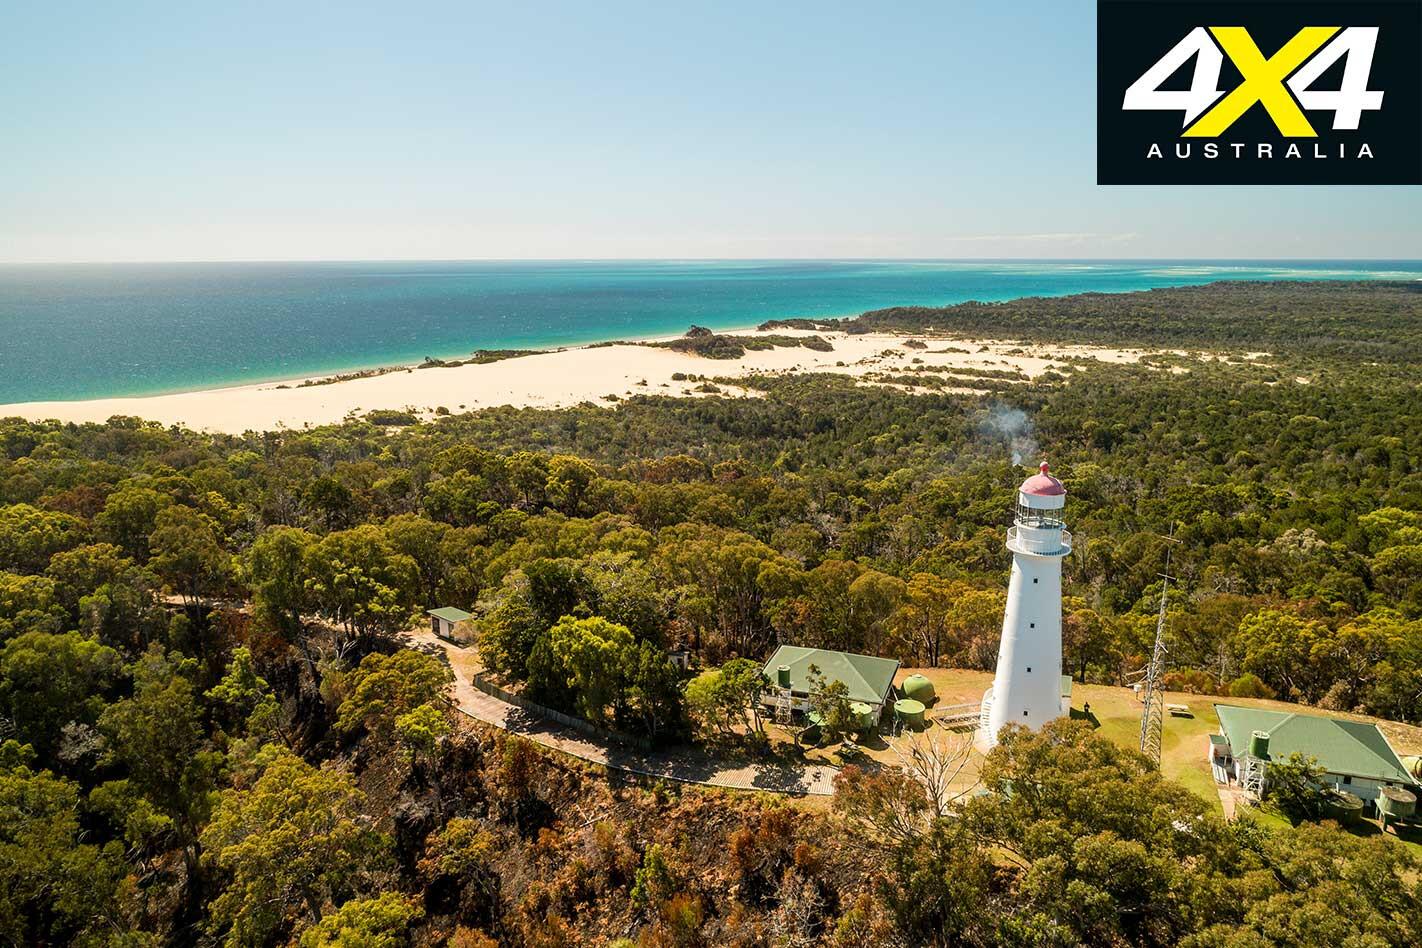 4 X 4 Adventure Series South East Queensland Part 2 Sandy Cape Lighthouse Jpg